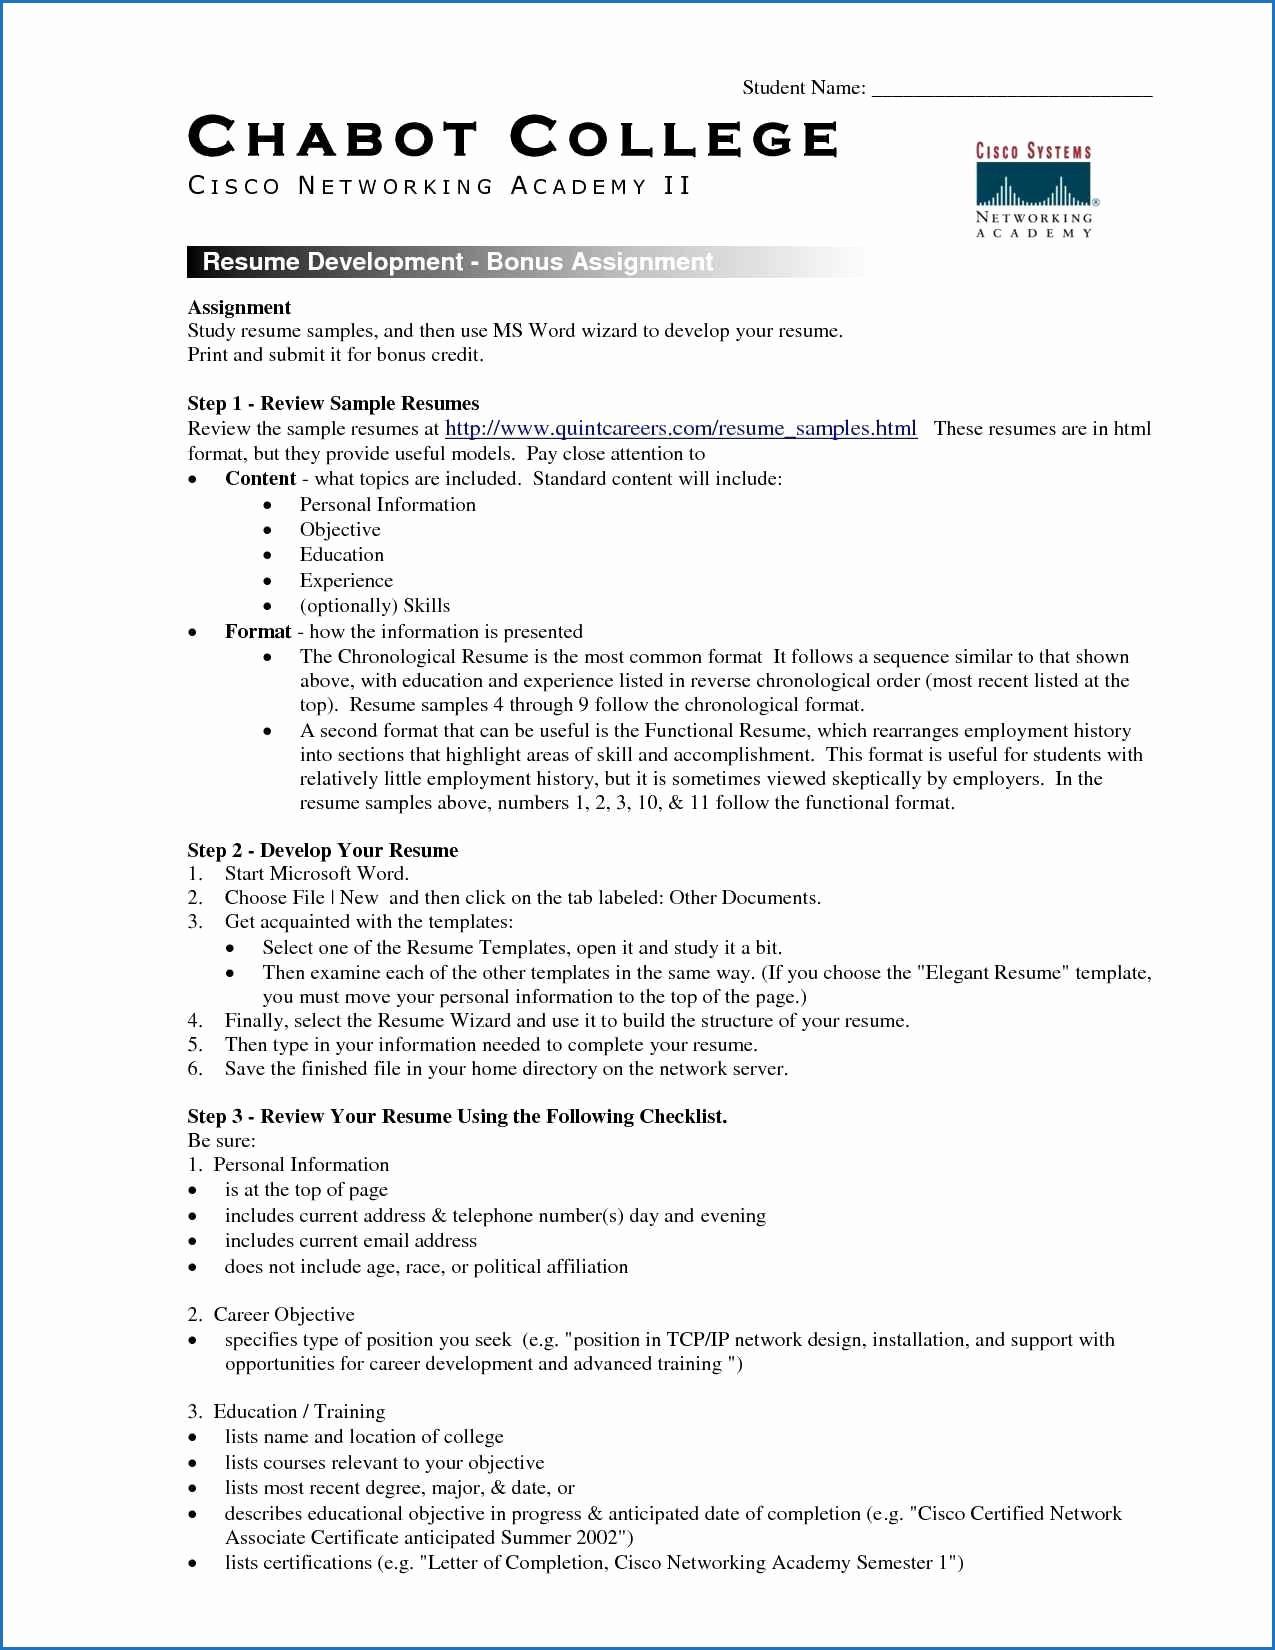 Microsoft Resume Templates Free Download New Resume and Template Best Resume Templates 2019 Word Best